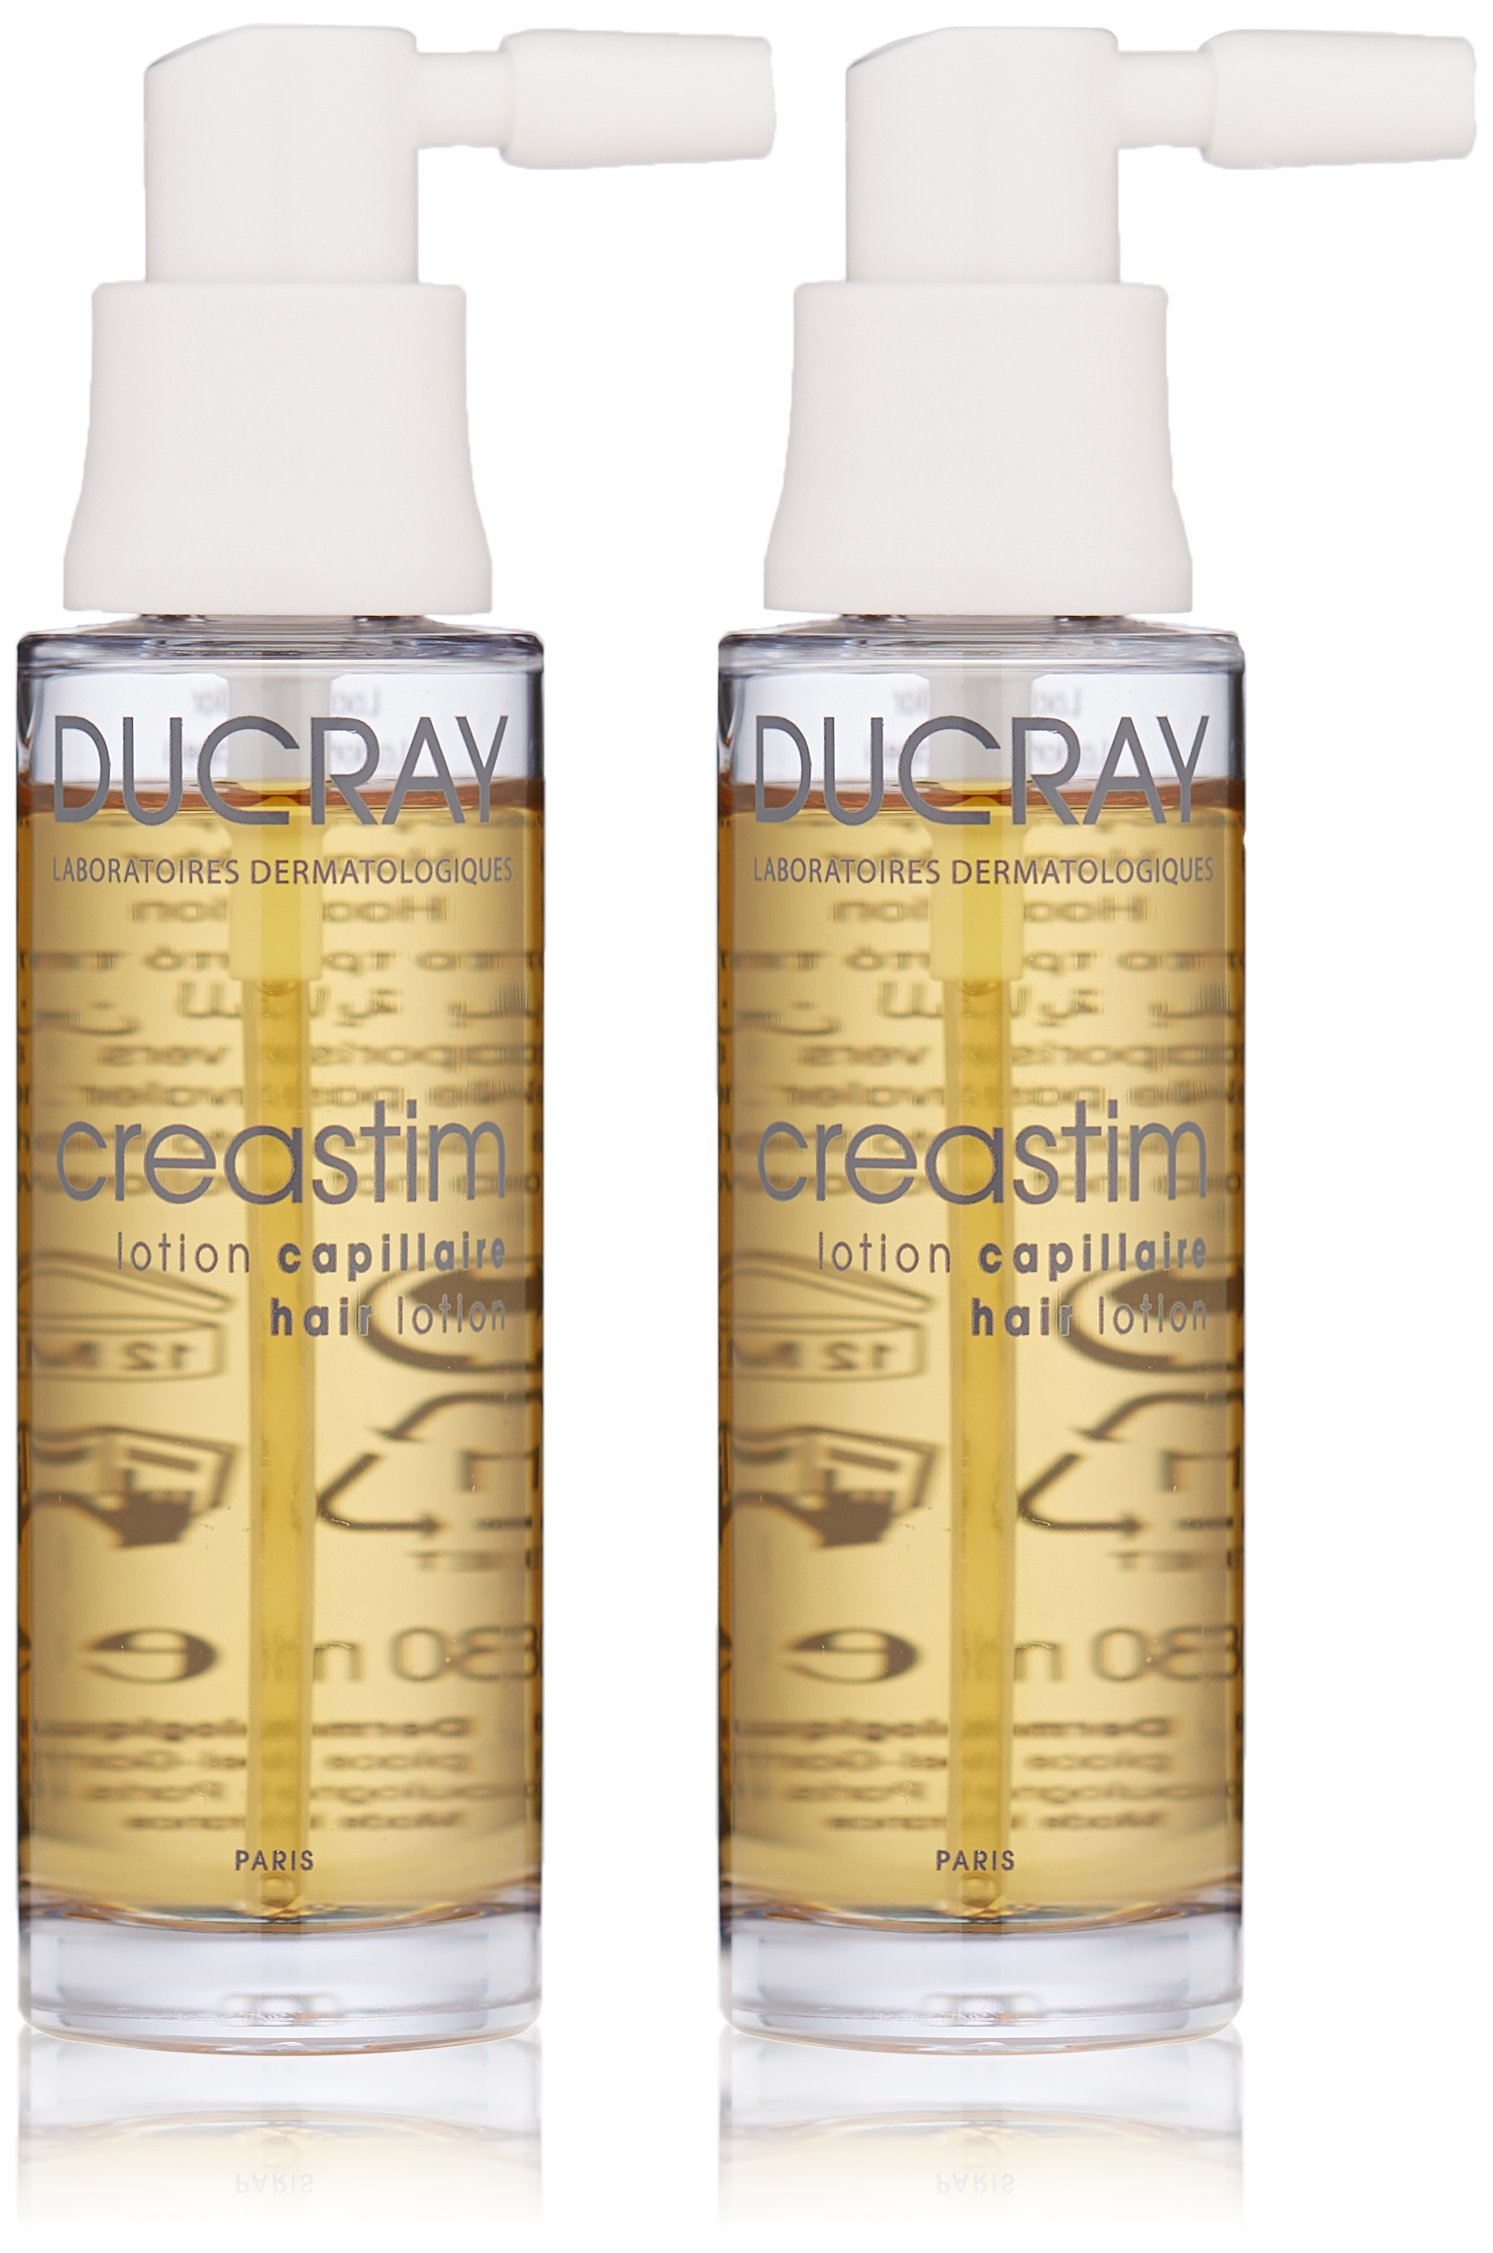 Ducray Creastim Hair Lotion Spray,  Men & Women, Strengthening Treatment for Sudden, Reactional Thinnnign Hair, 2 x 1 oz.